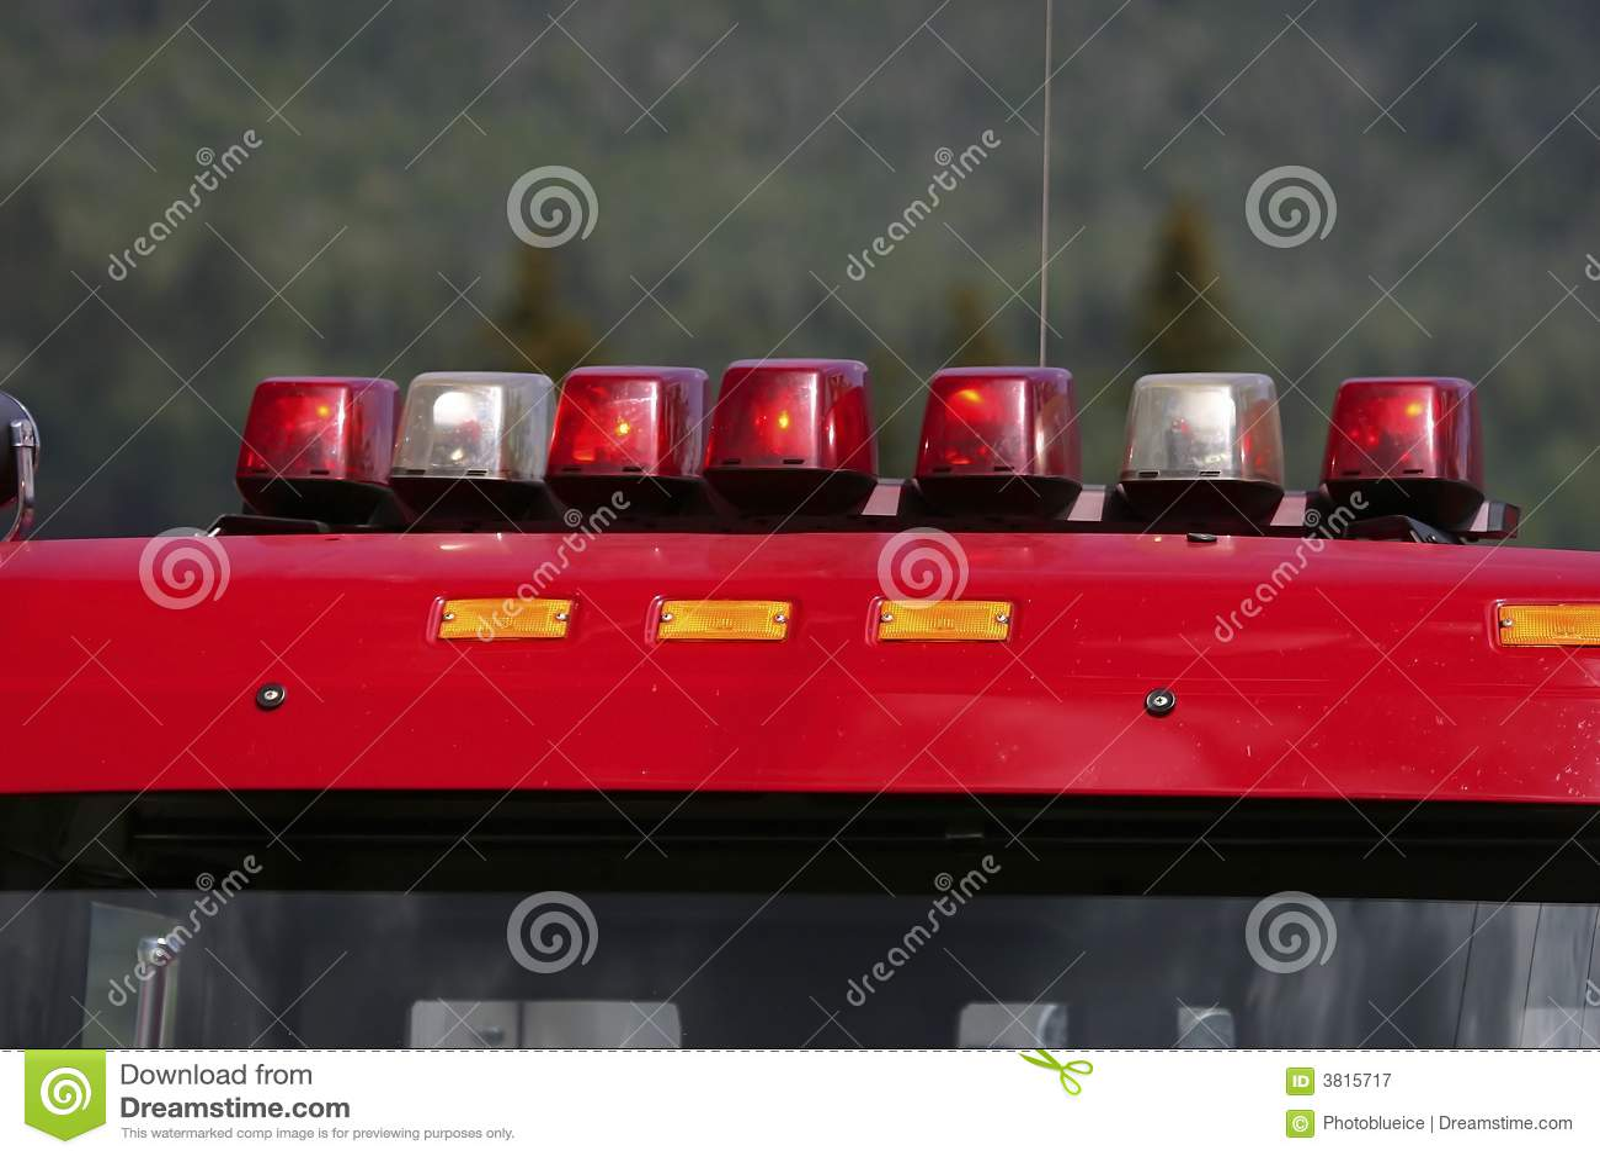 photography 162 emergency lights on a fire truck image 3815717. Black Bedroom Furniture Sets. Home Design Ideas